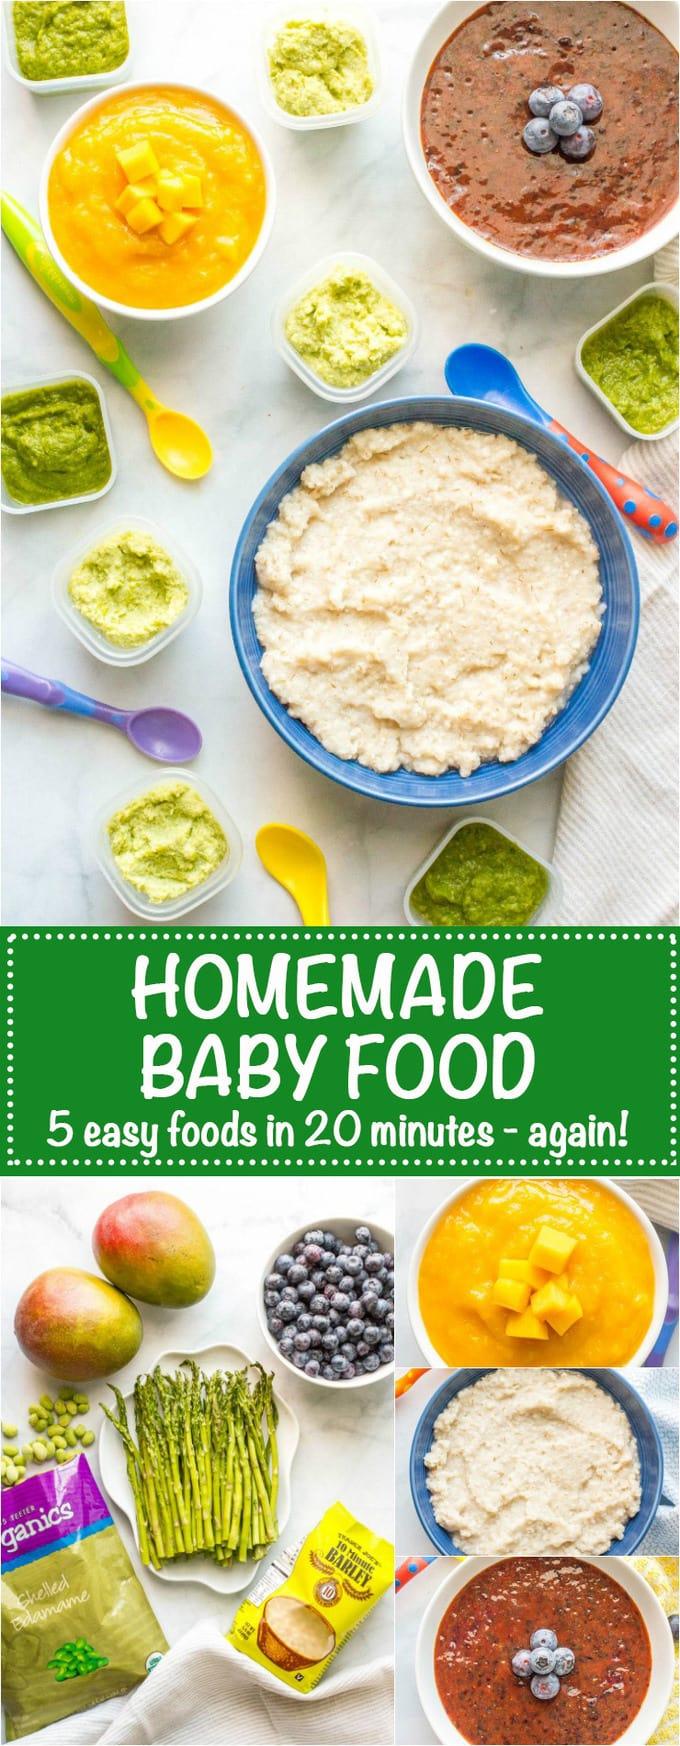 Homemade baby food barley asparagus edamame blueberries ...